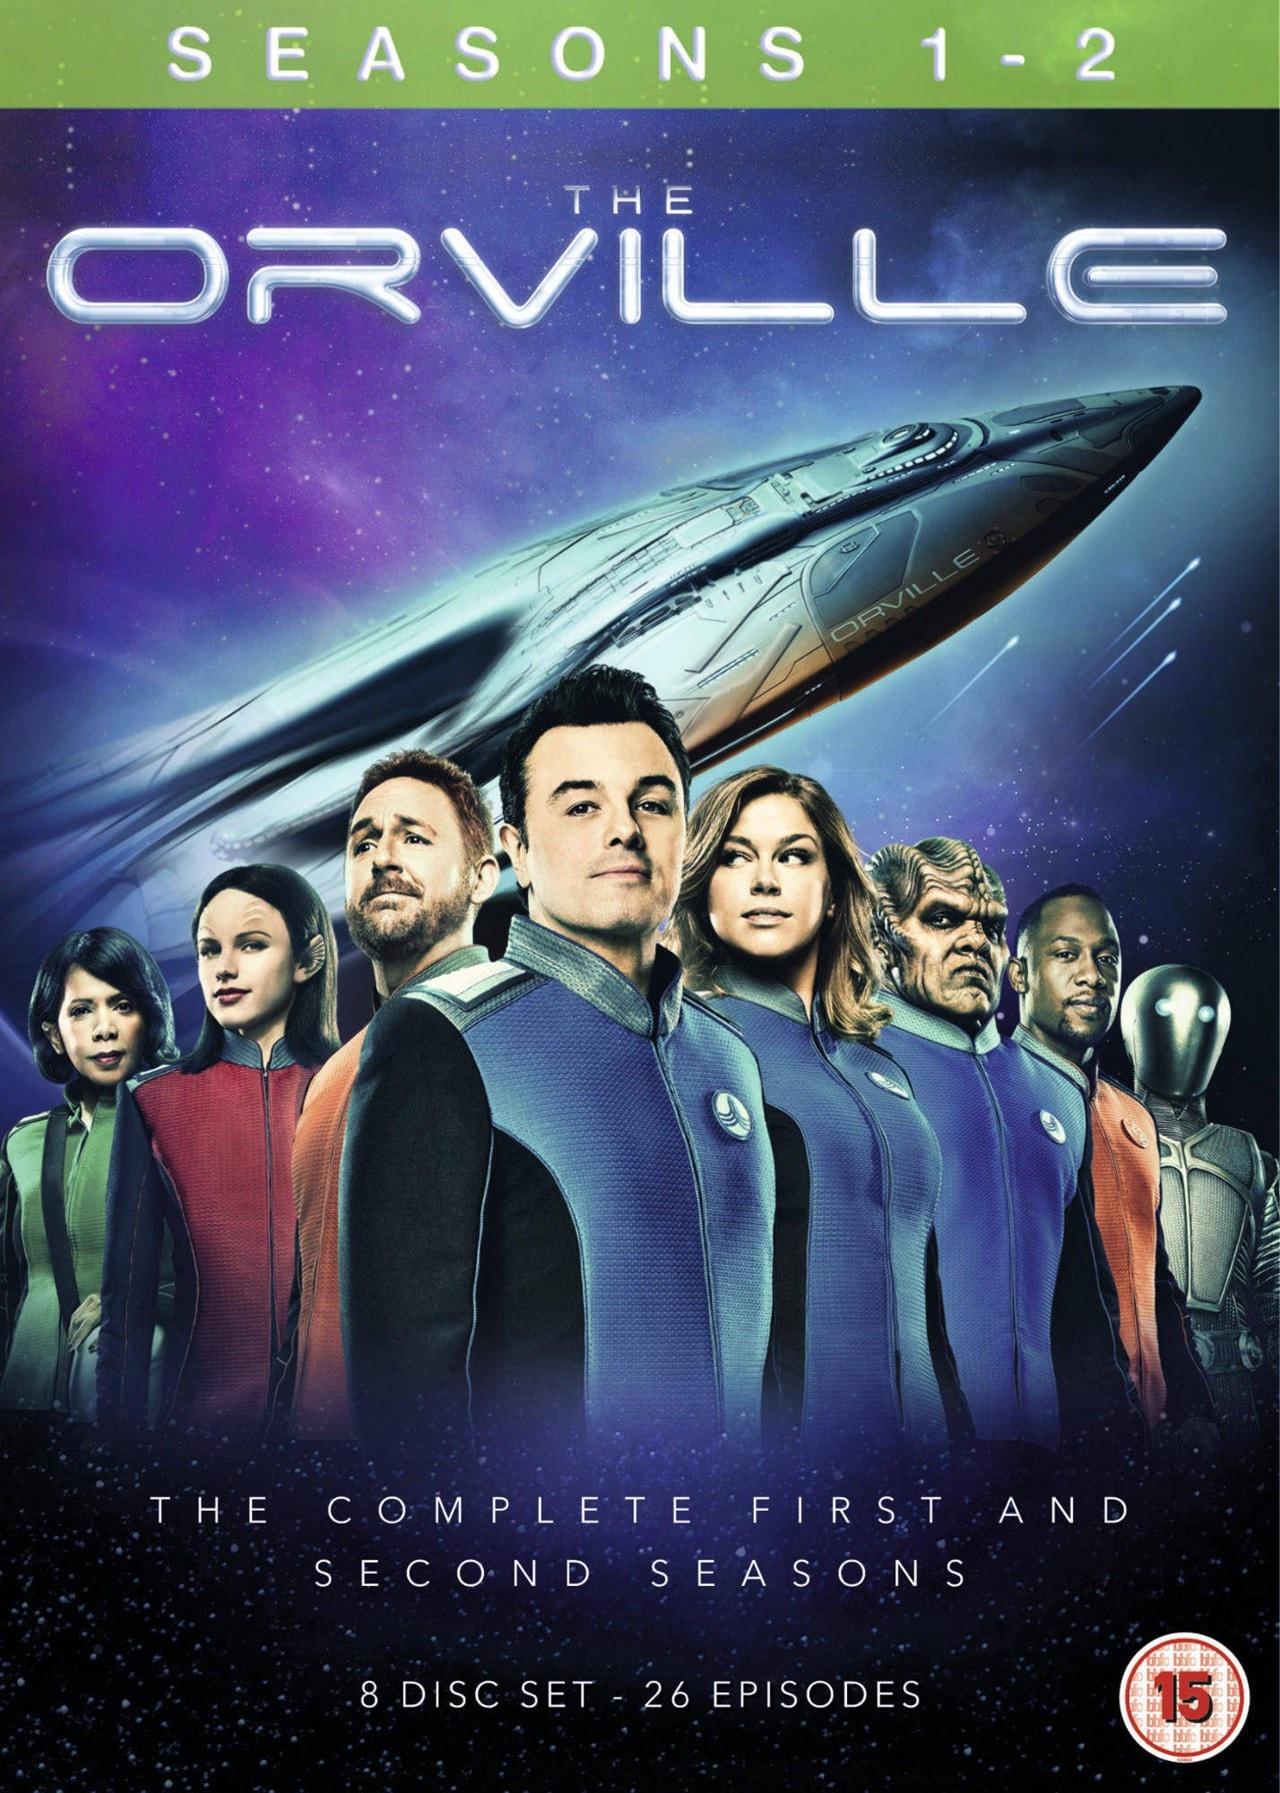 The Orville: Seasons 1-2 - 1